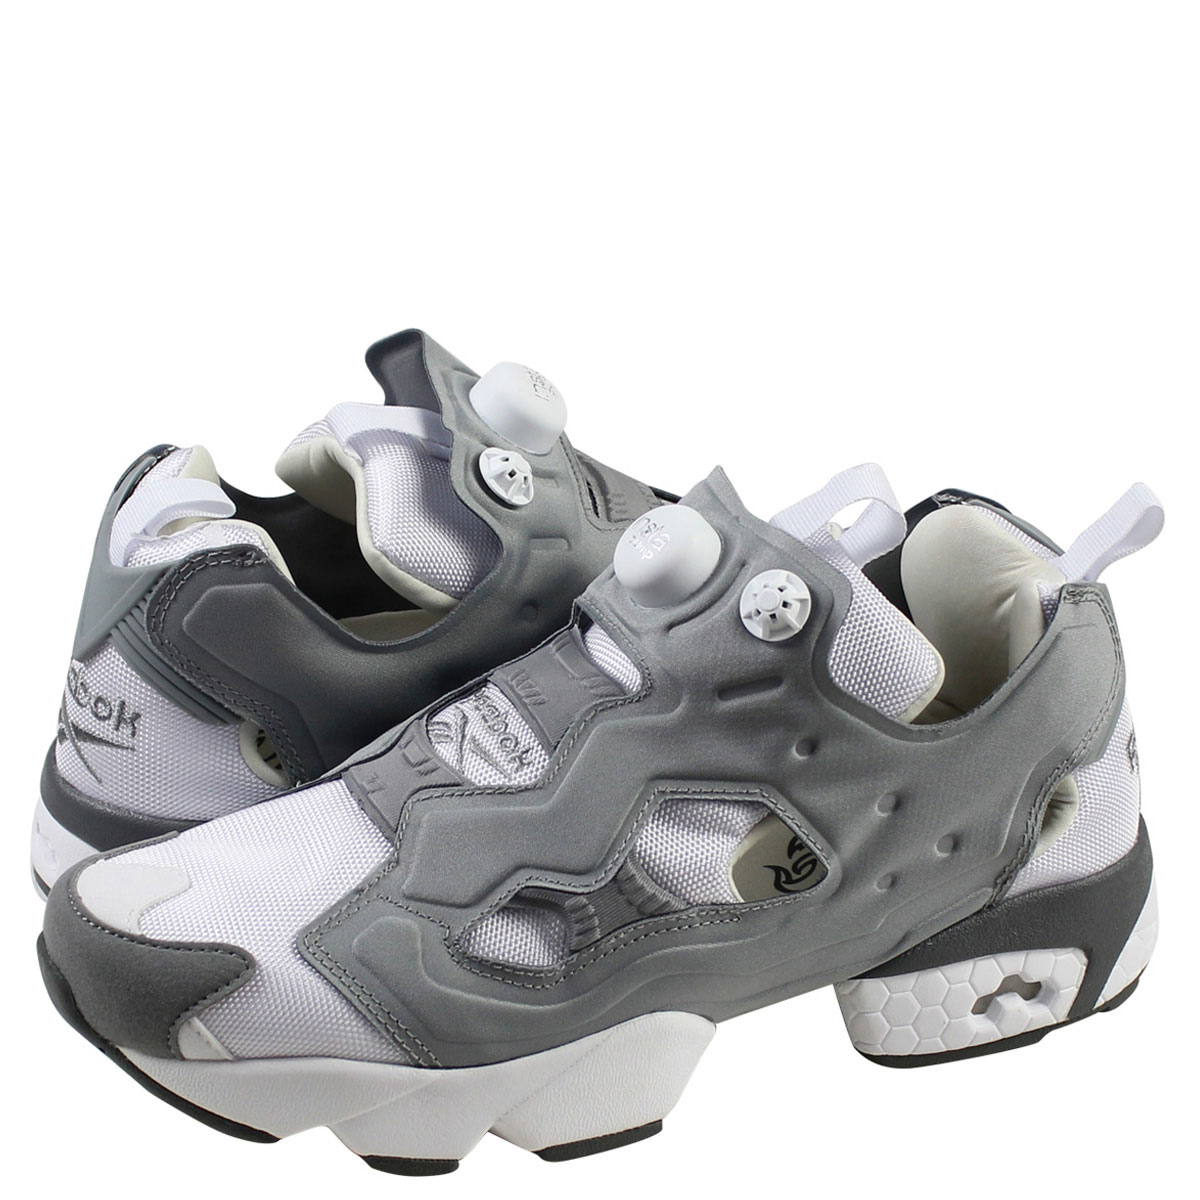 76e0aeff2a18 reebok pump womens grey cheap   OFF74% The Largest Catalog Discounts